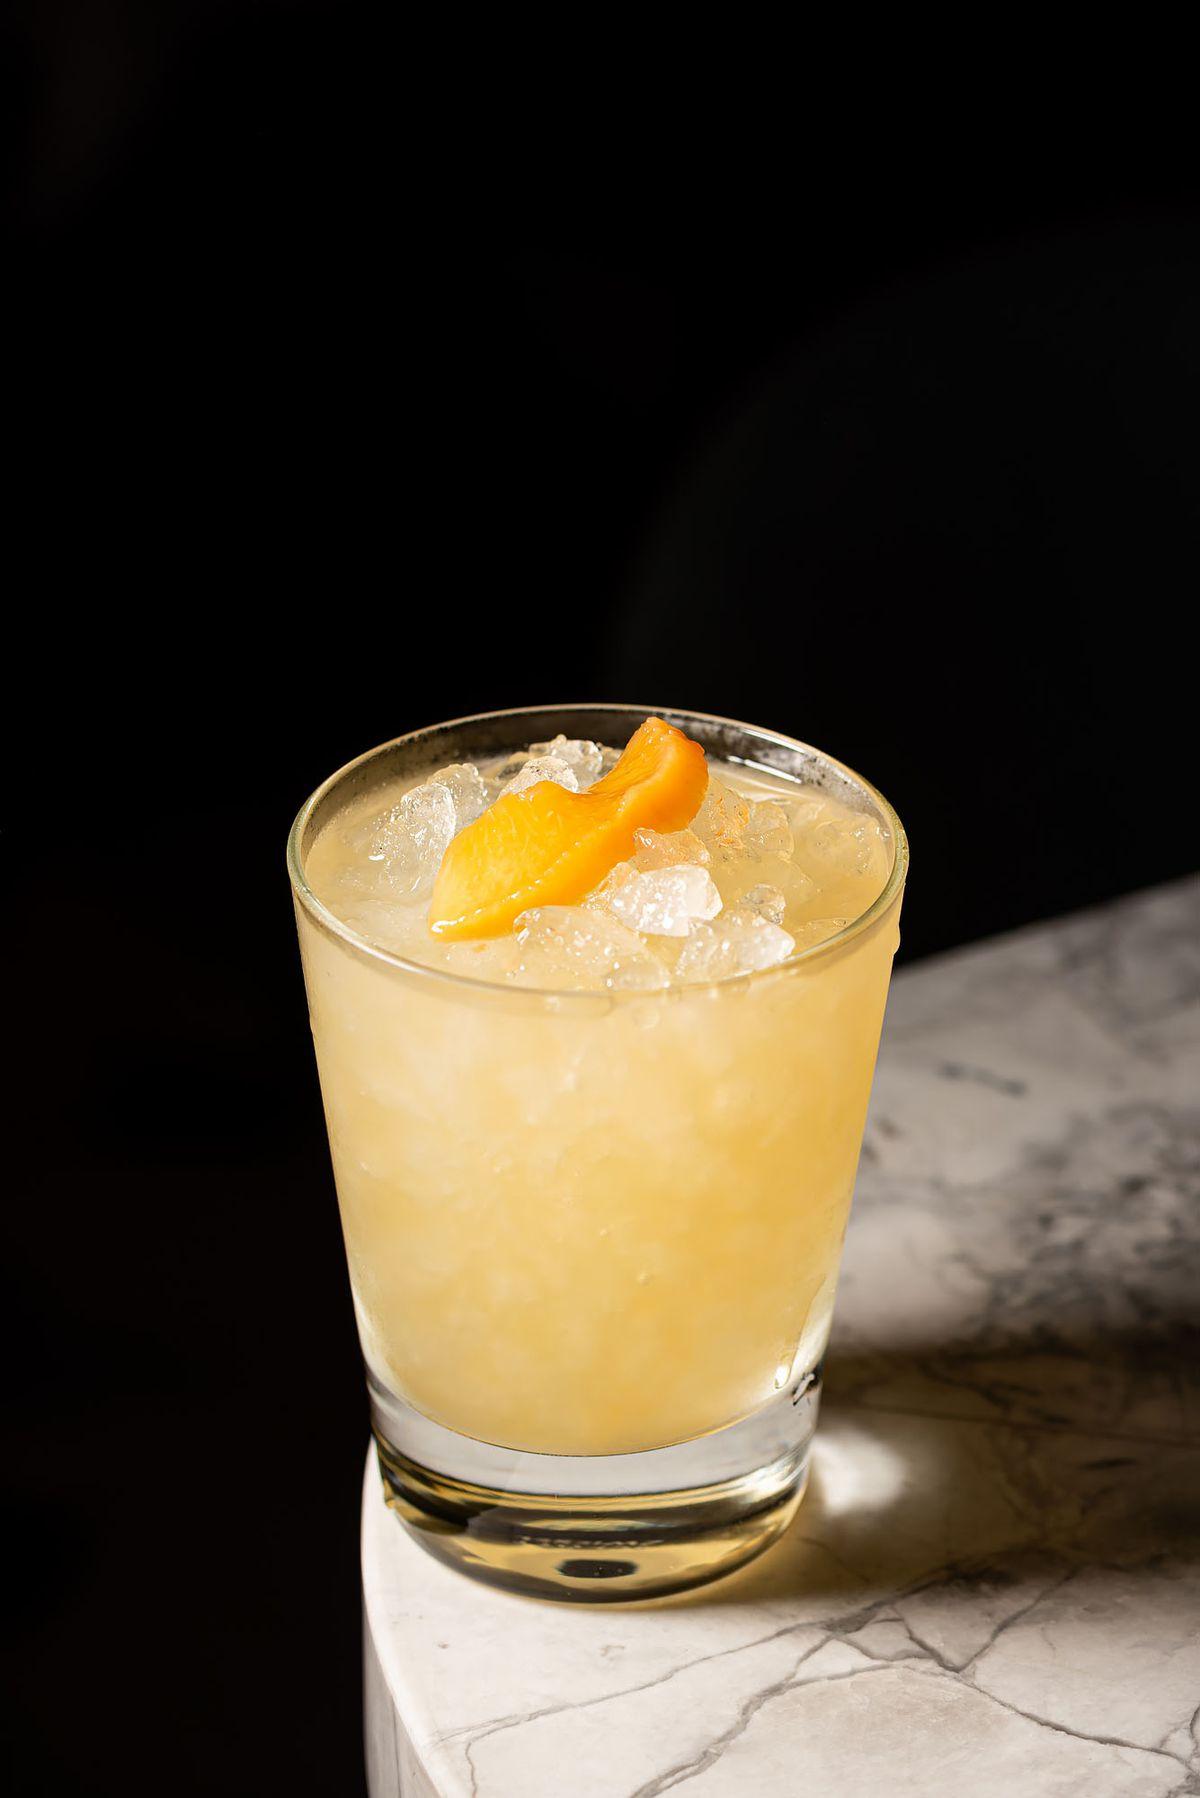 Oaxacan cocktail with mezcal espadin, reposado tequila, peach-habanero shrub, lemon, orange at Gigi's Hollywood in a glass.